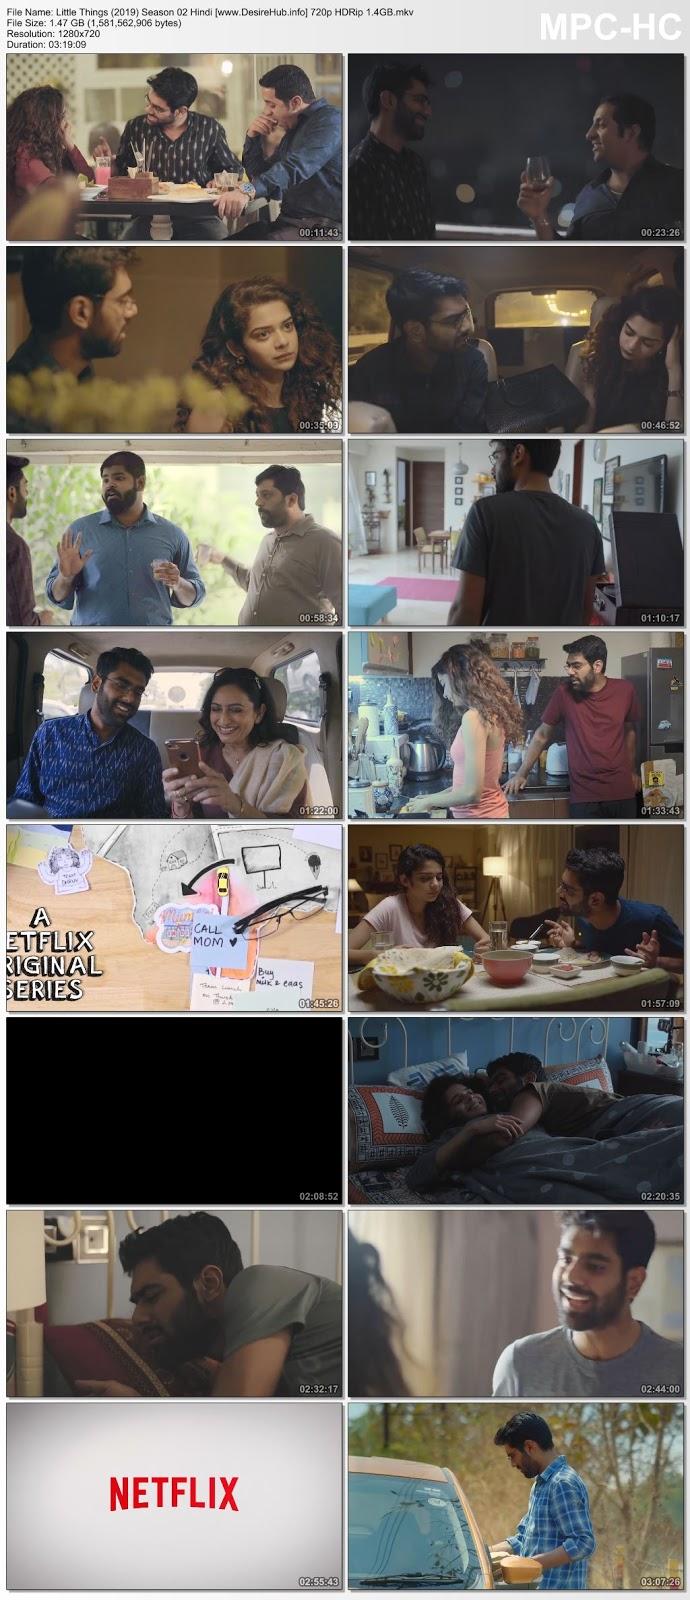 Little Things 2019 Complete S2 Hindi 720p WEB-DL 1.4GB Desirehub